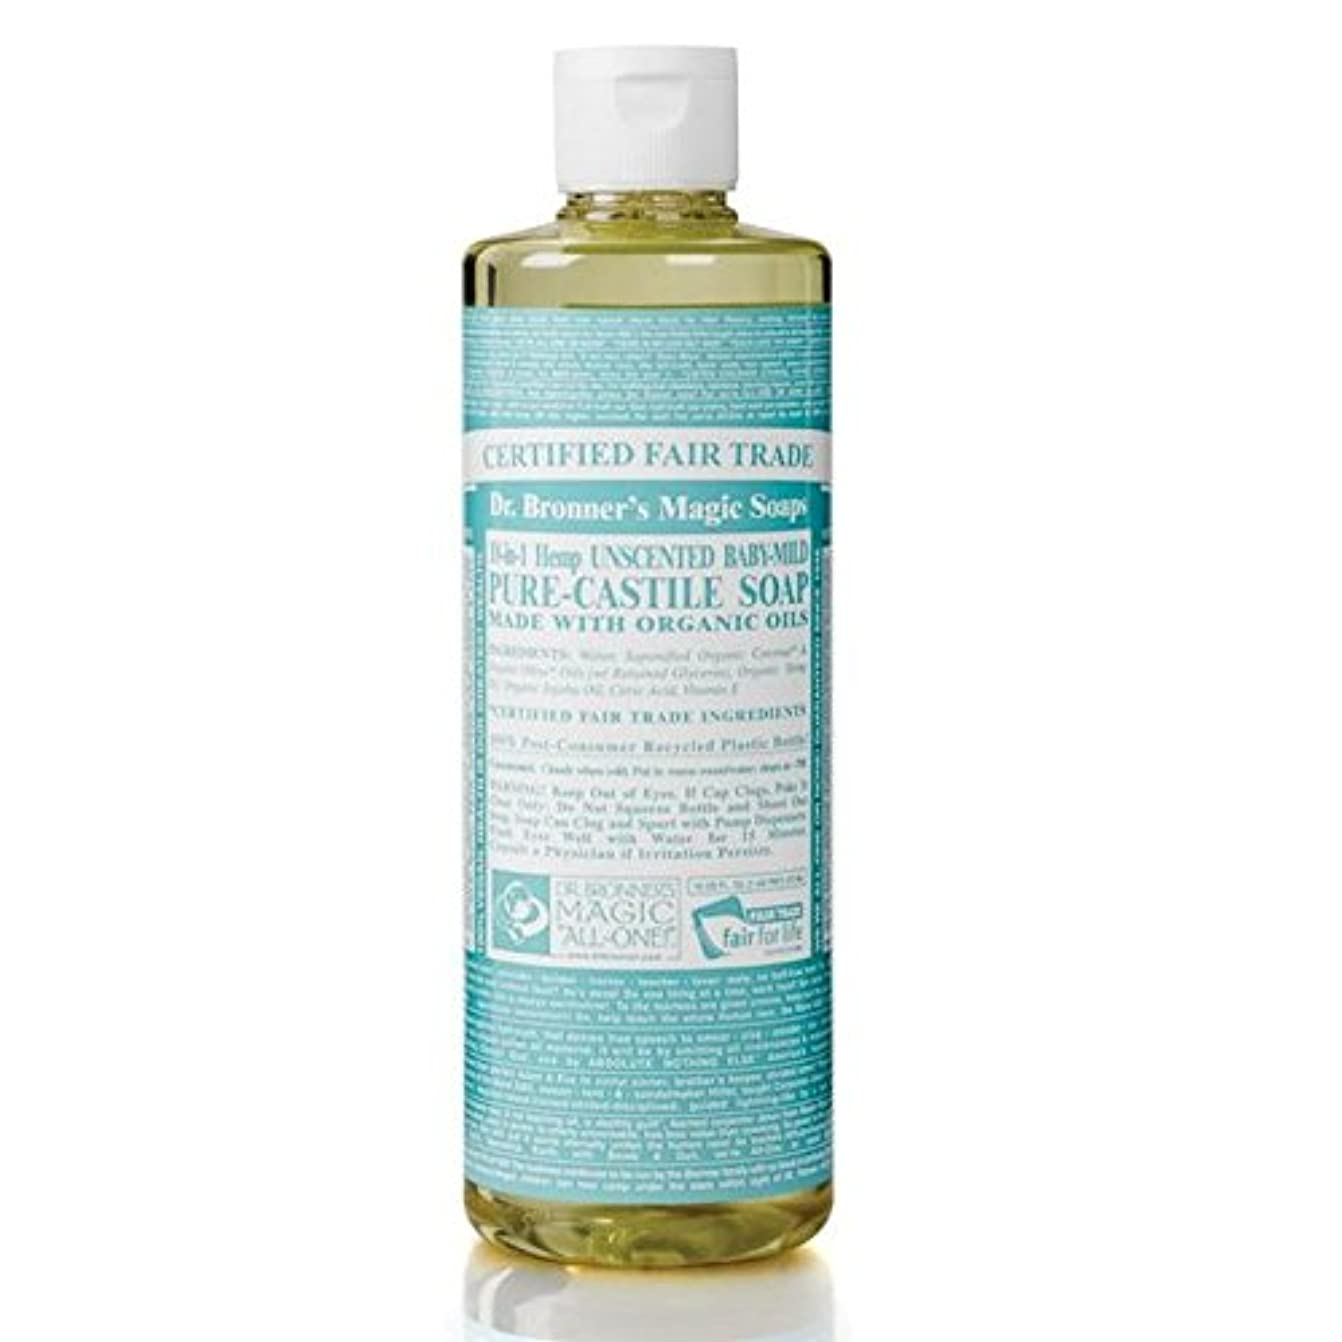 Dr Bronner Organic Baby Mild Castile Liquid Soap 473ml - のブロナーオーガニックベビーマイルドなカスティーリャ液体石鹸473ミリリットル [並行輸入品]